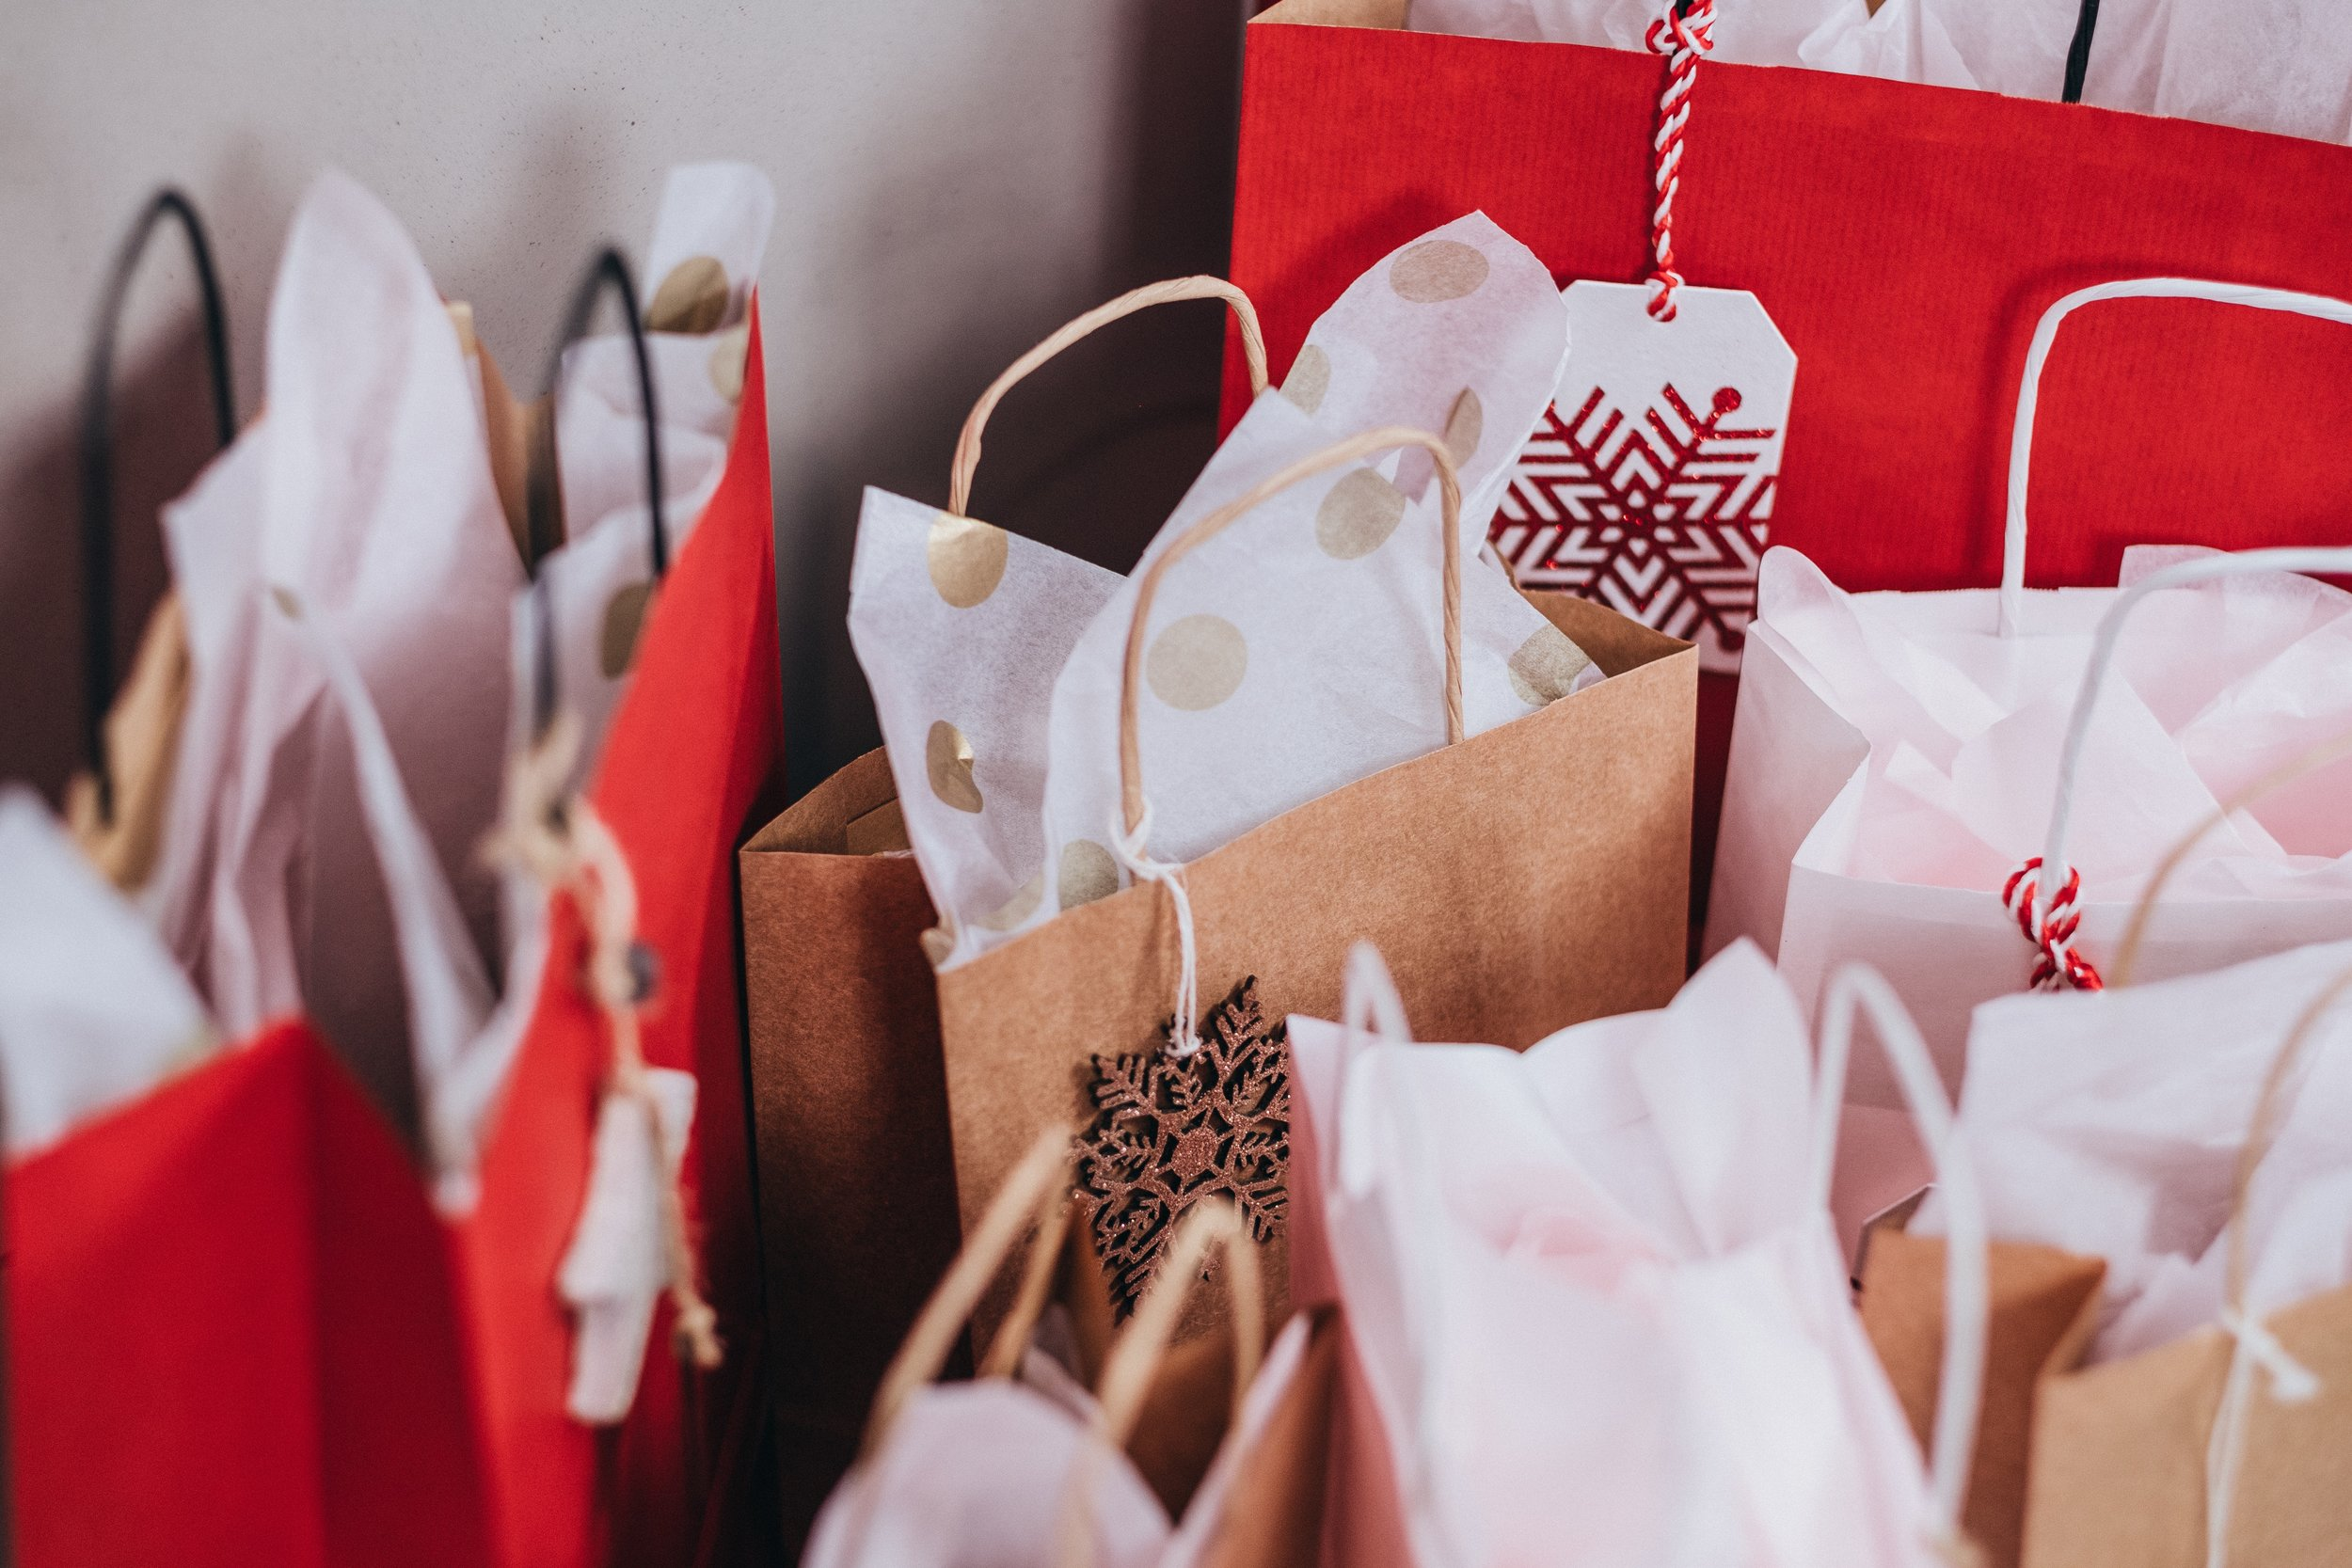 bags-black-friday-christmas-749353.jpg